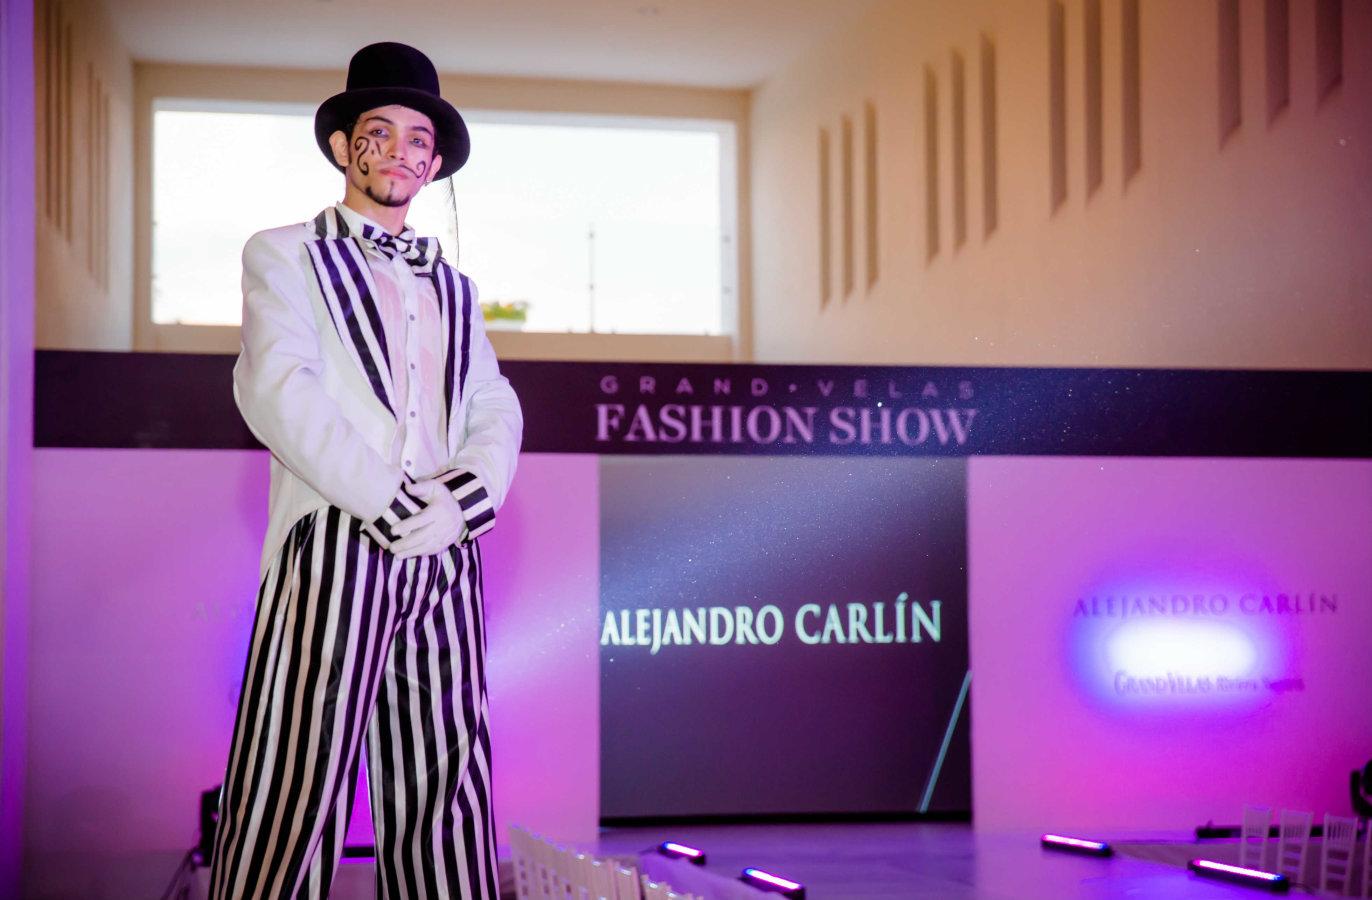 Riviera Nayarit se viste a la moda con el Grand Velas Fashion Show